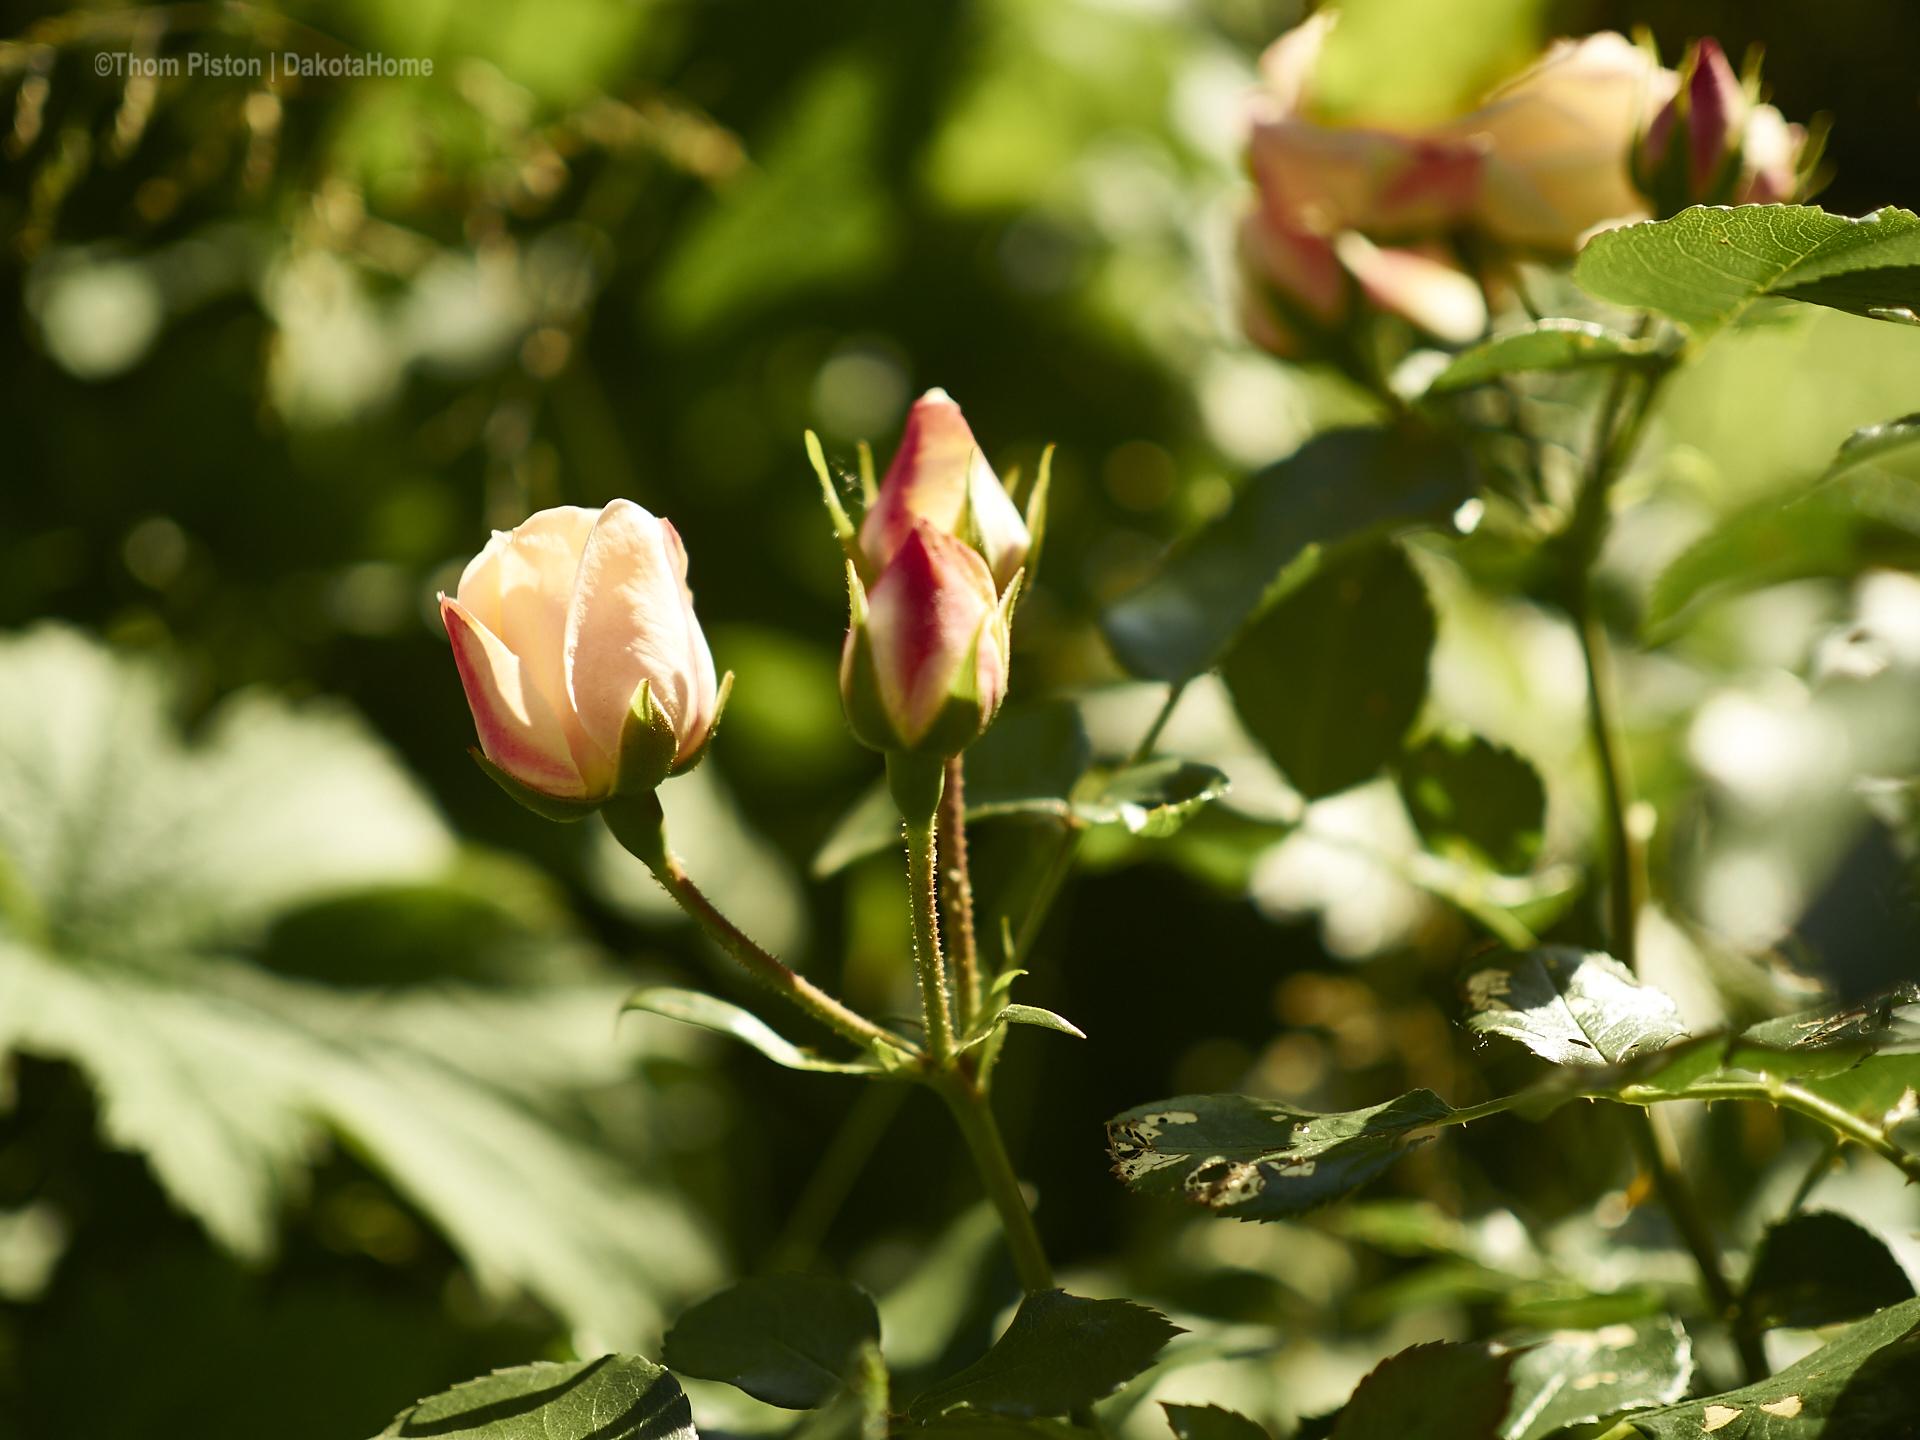 andere rosen haha